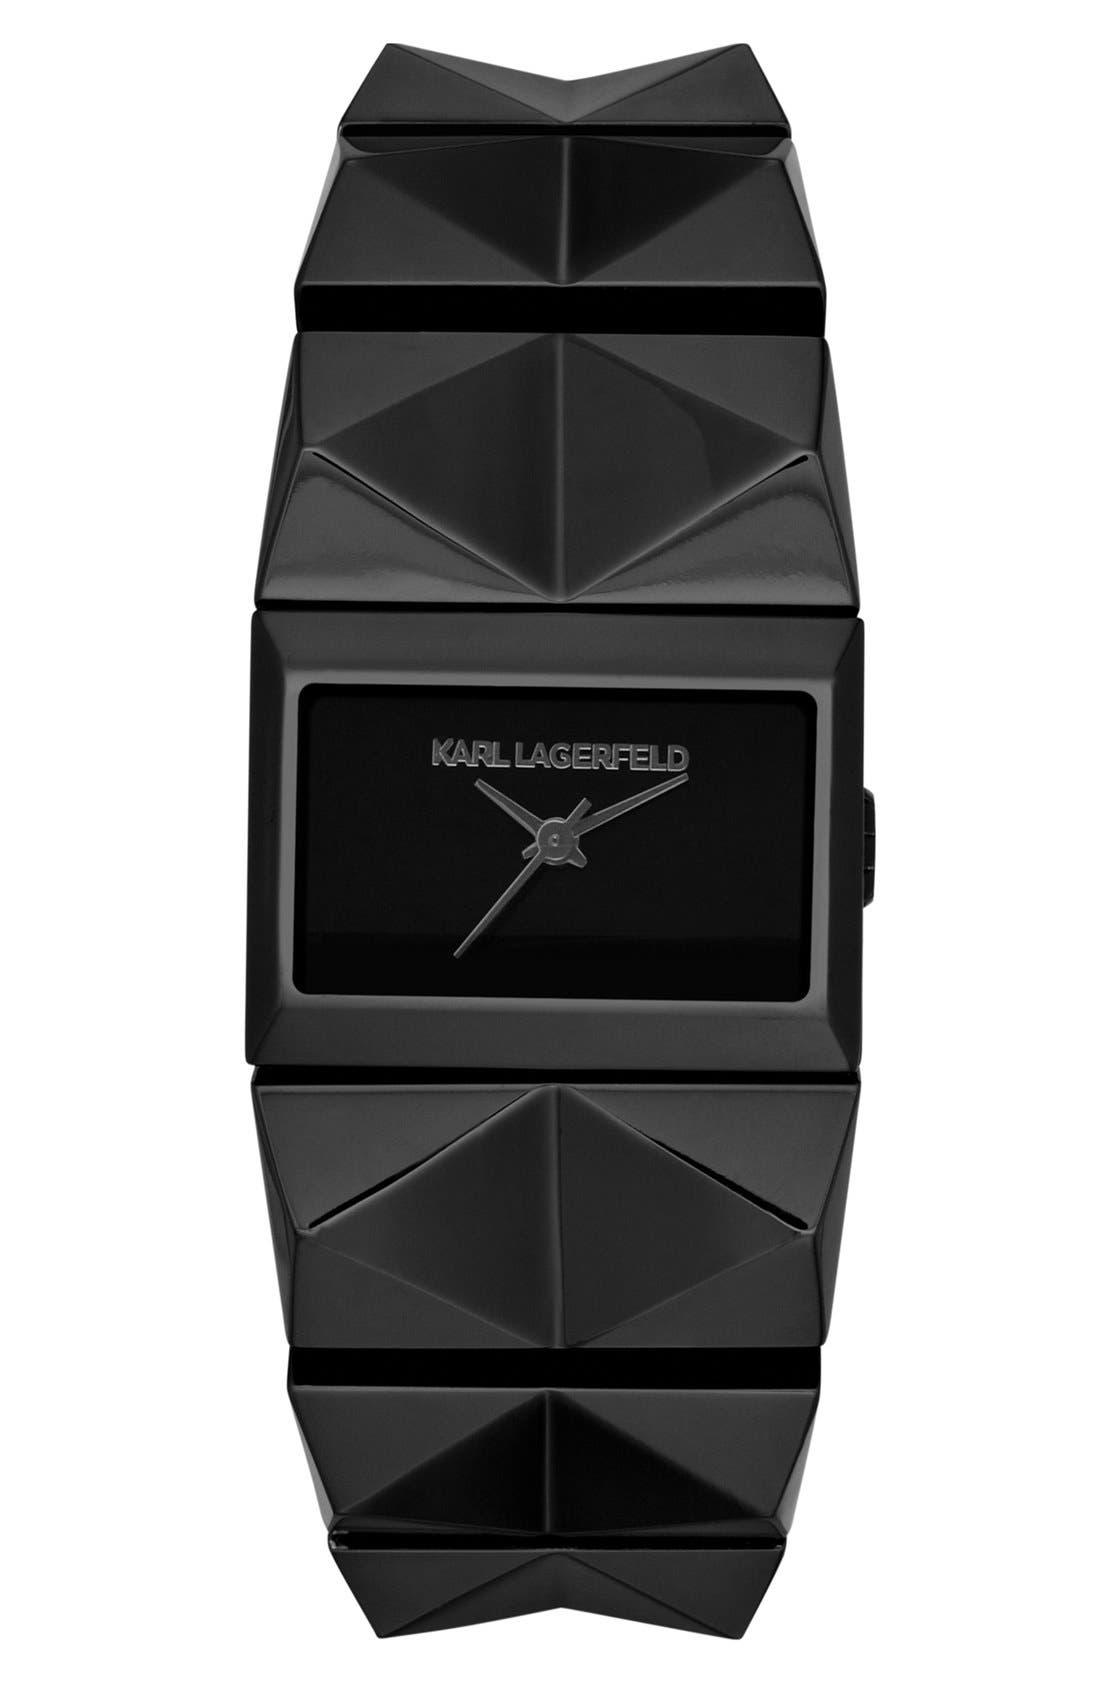 Main Image - KARL LAGERFELD 'Perspektive' Pyramid Bracelet Watch, 27mm x 20mm